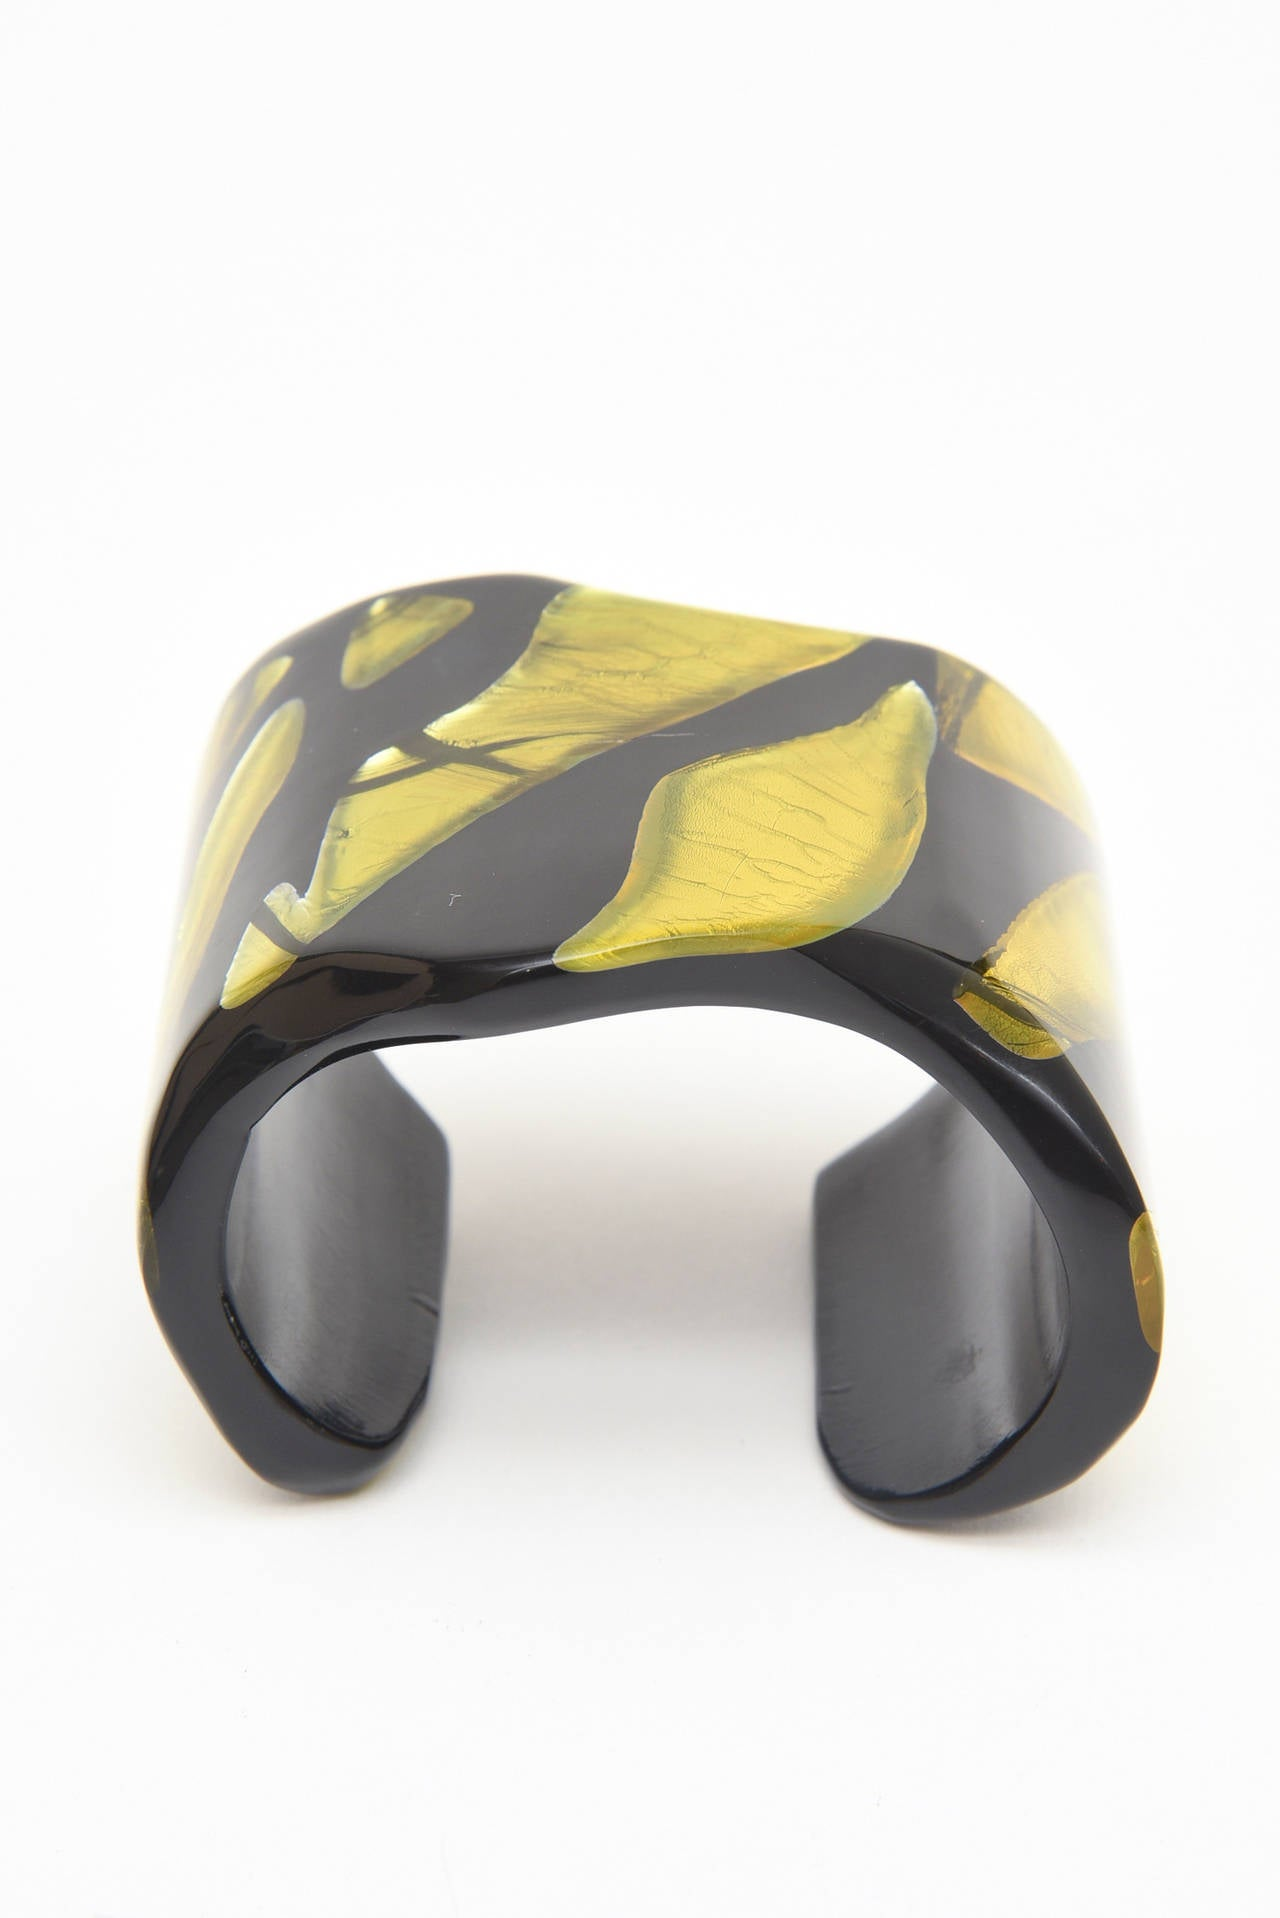 Modern Frank Vigneri Signed Plexiglass Sculptural Cuff Bracelet Italian  For Sale